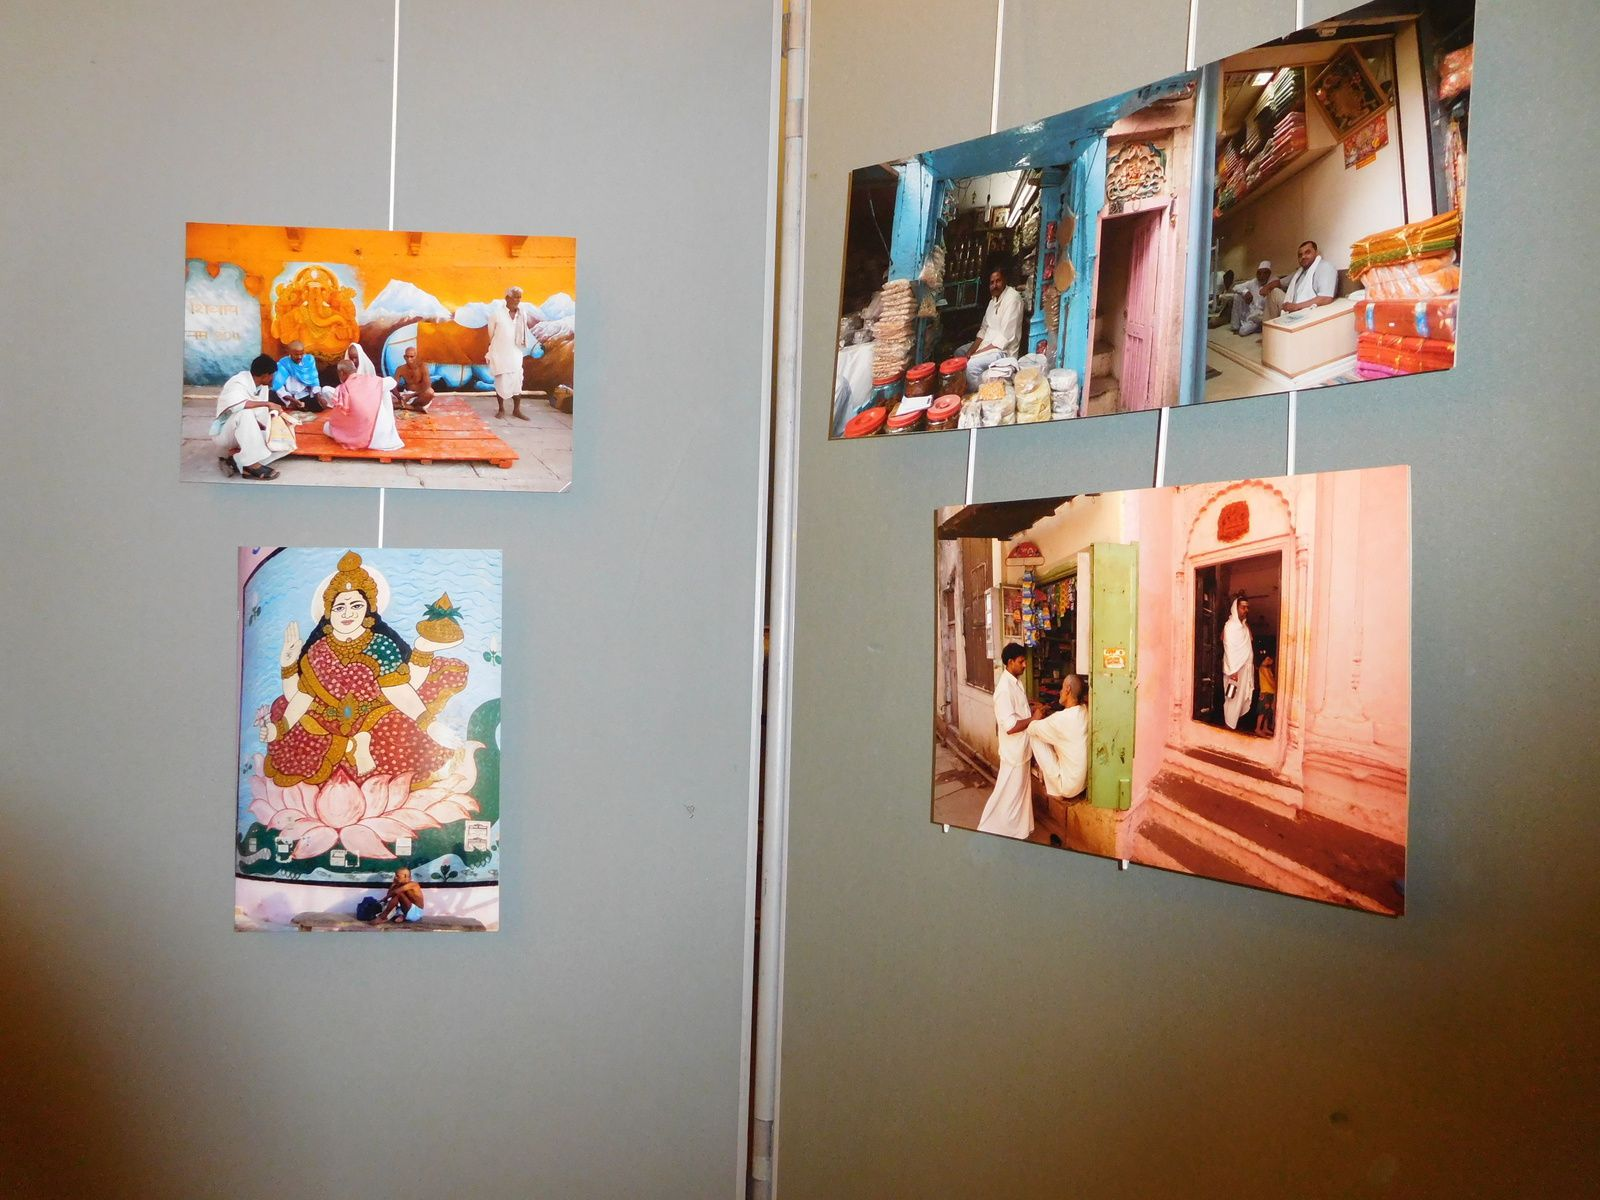 Le salon en images - Copyright : atasi